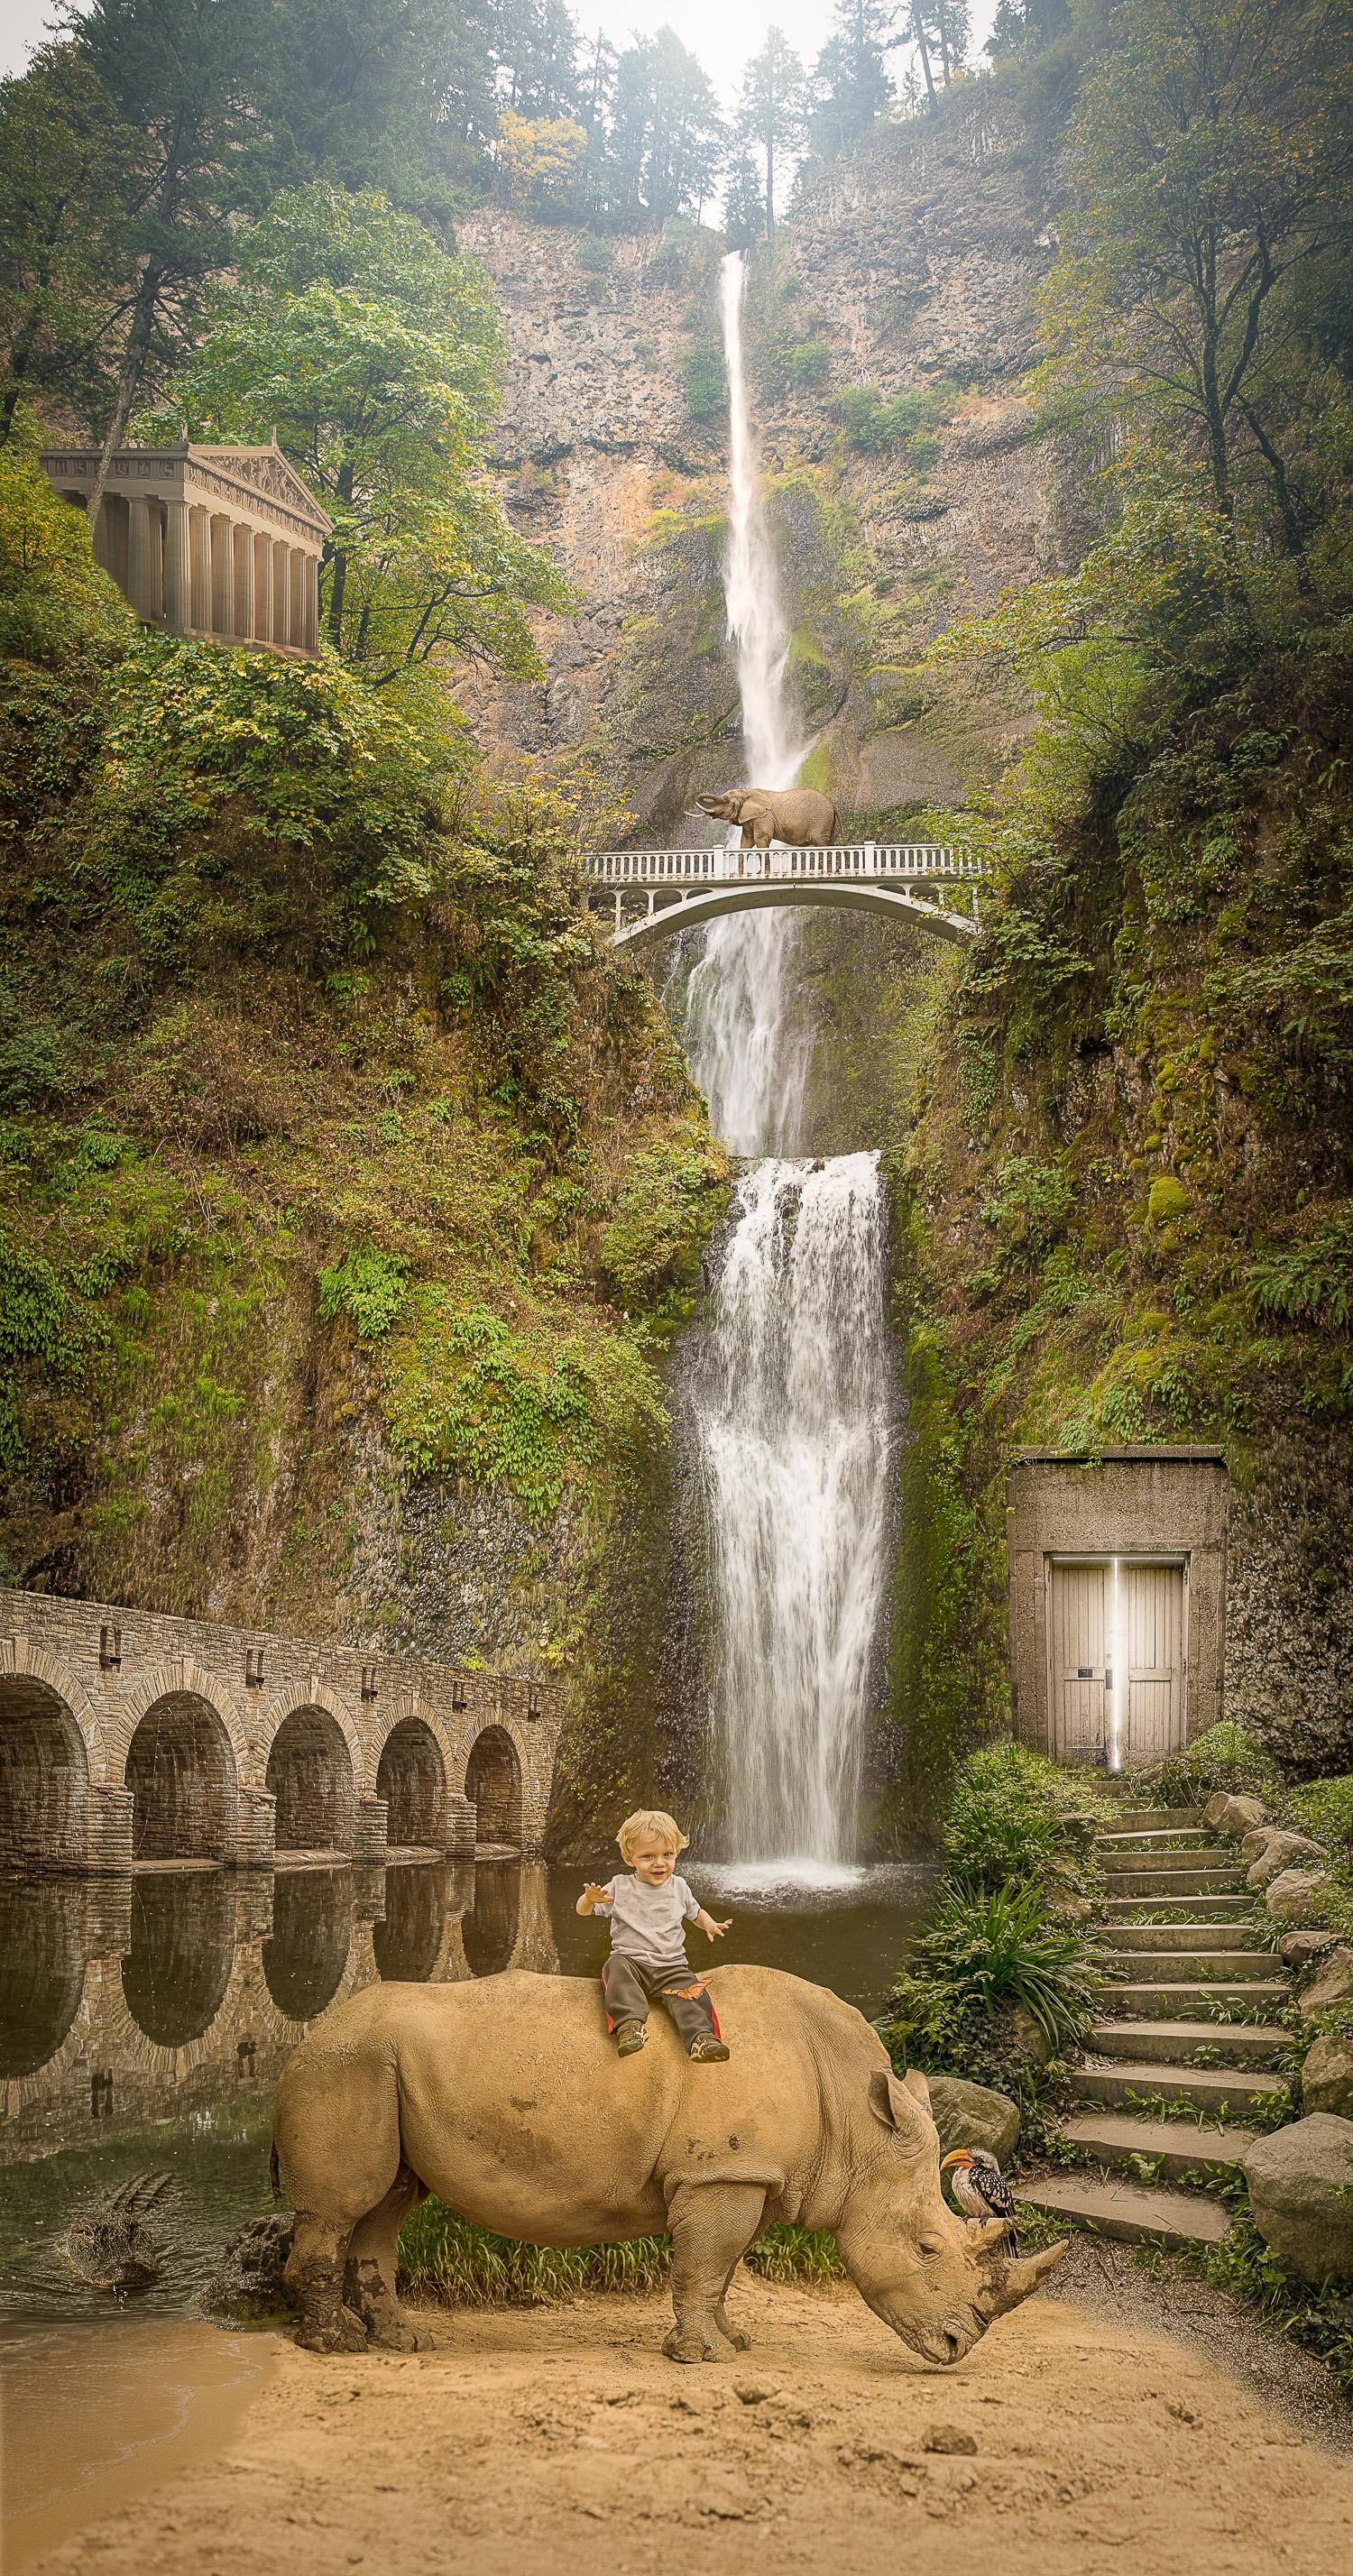 Photo manipulation & composite of a boy on rhinoceros near a waterfall